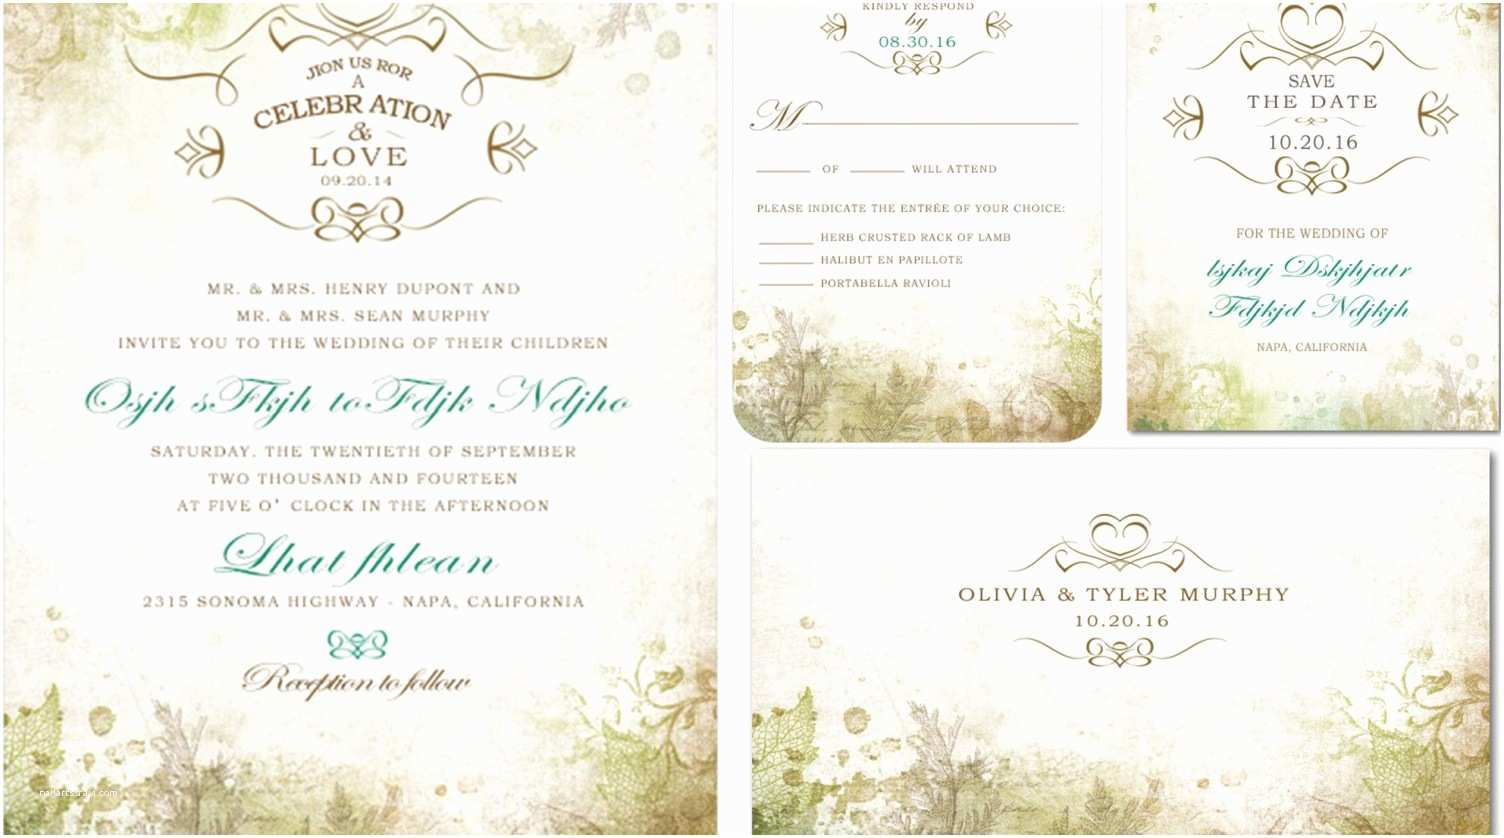 All In One Wedding Invitations Wedding Invitation Kits Capable Cheap All In E Weddi